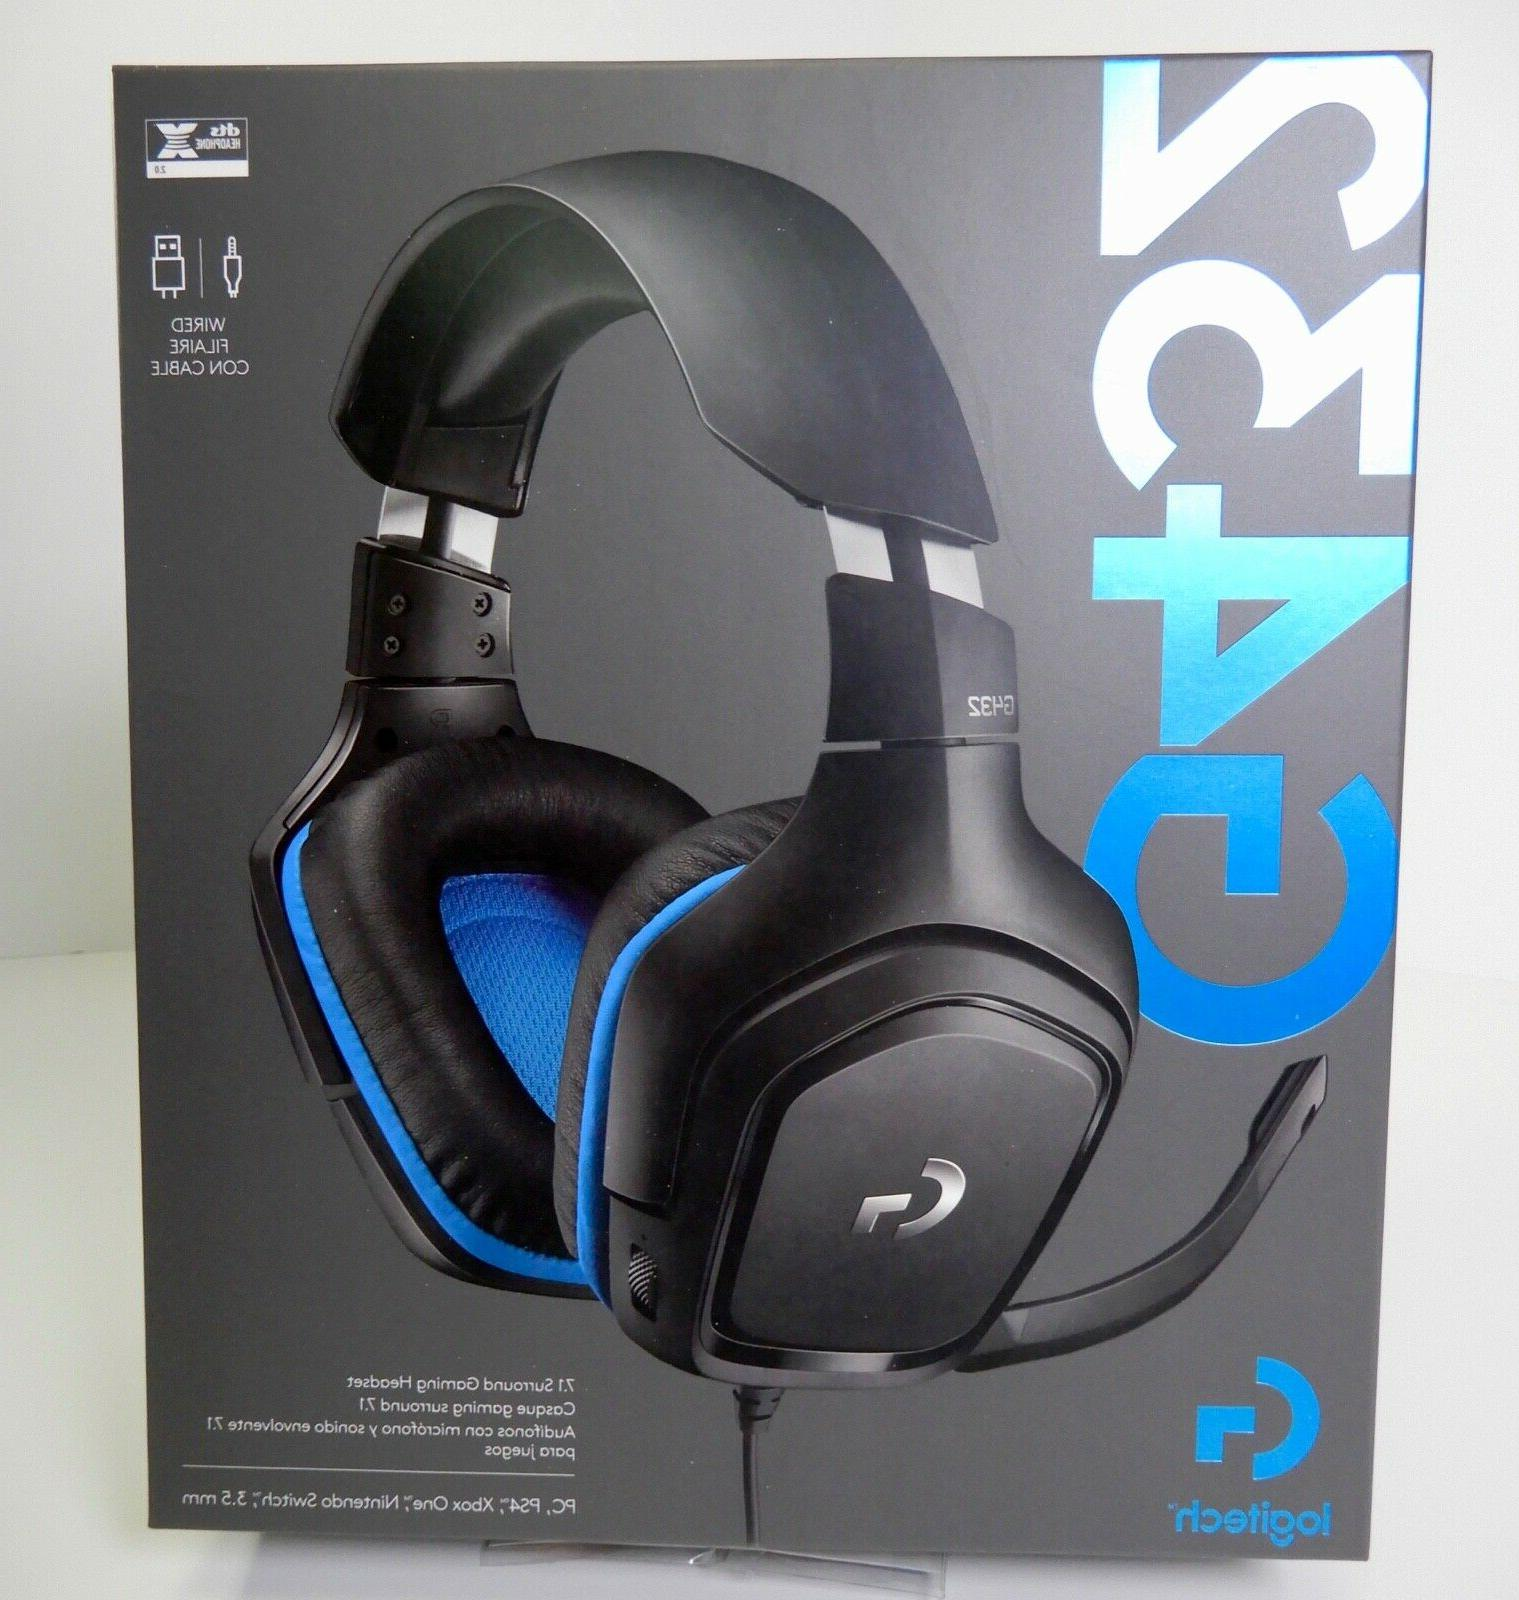 g432 gaming headset 7 1 surround sound